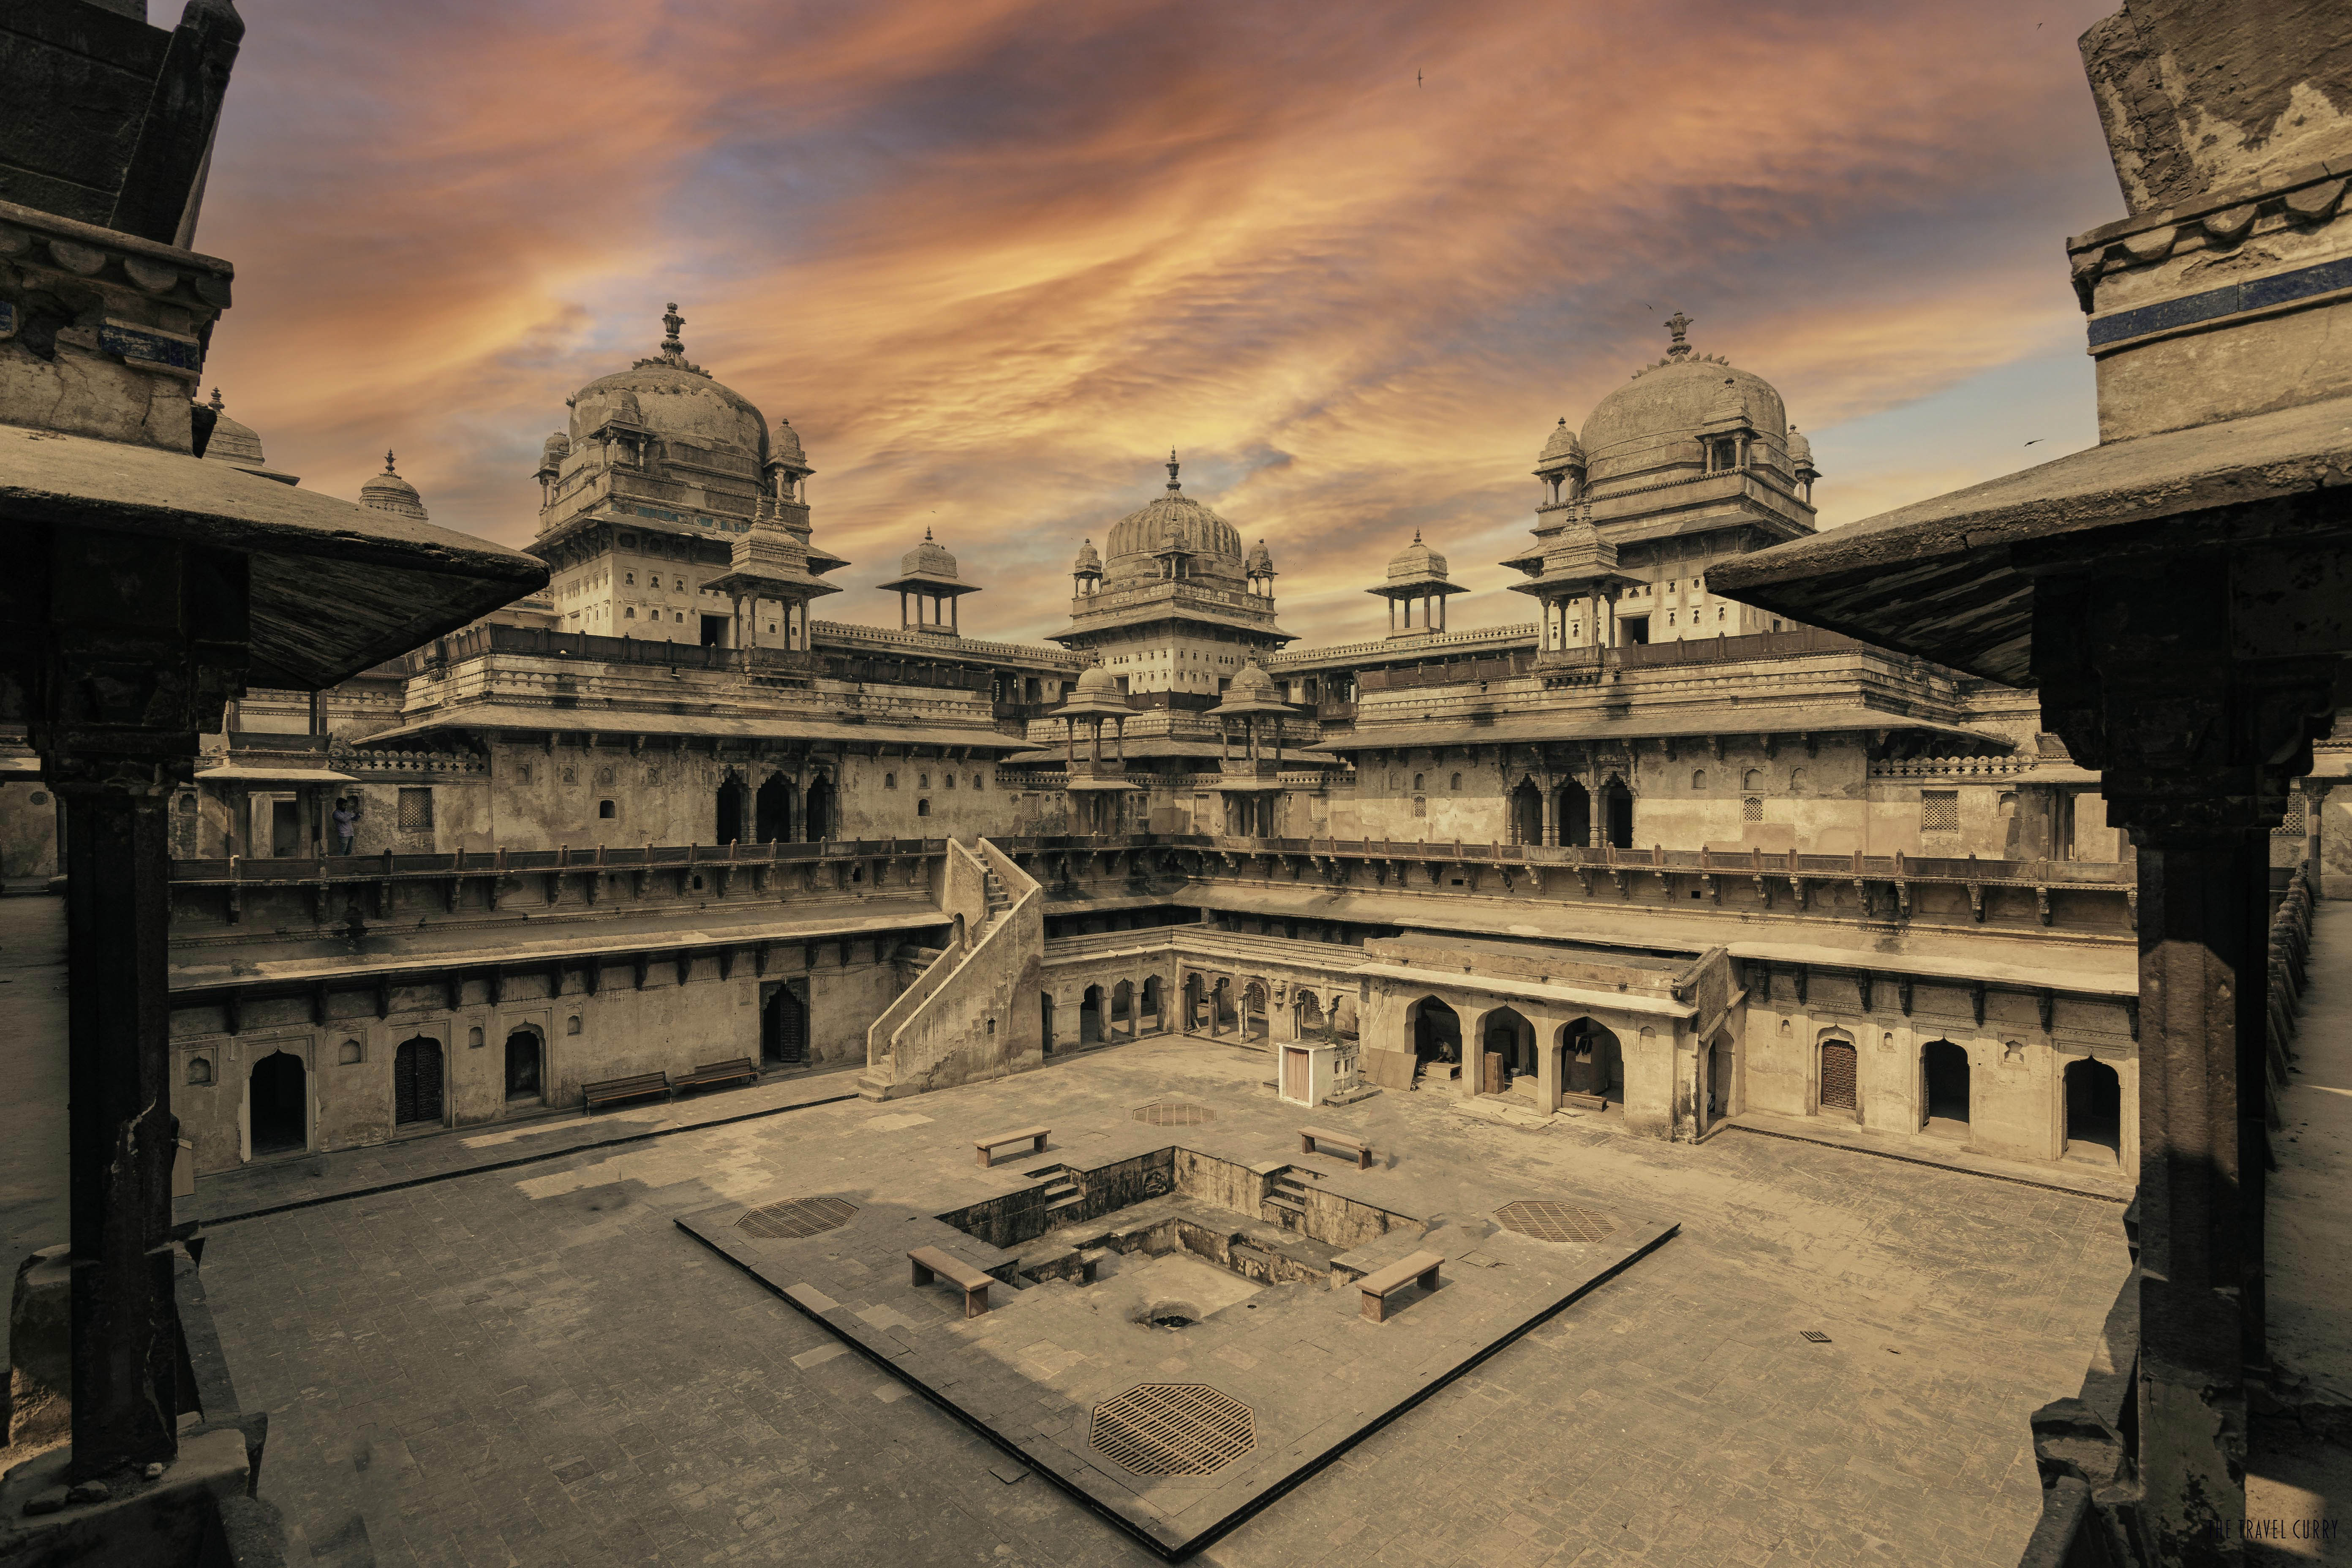 Illustrious Orchaa Fort's Jahangir Mahal Courtyard